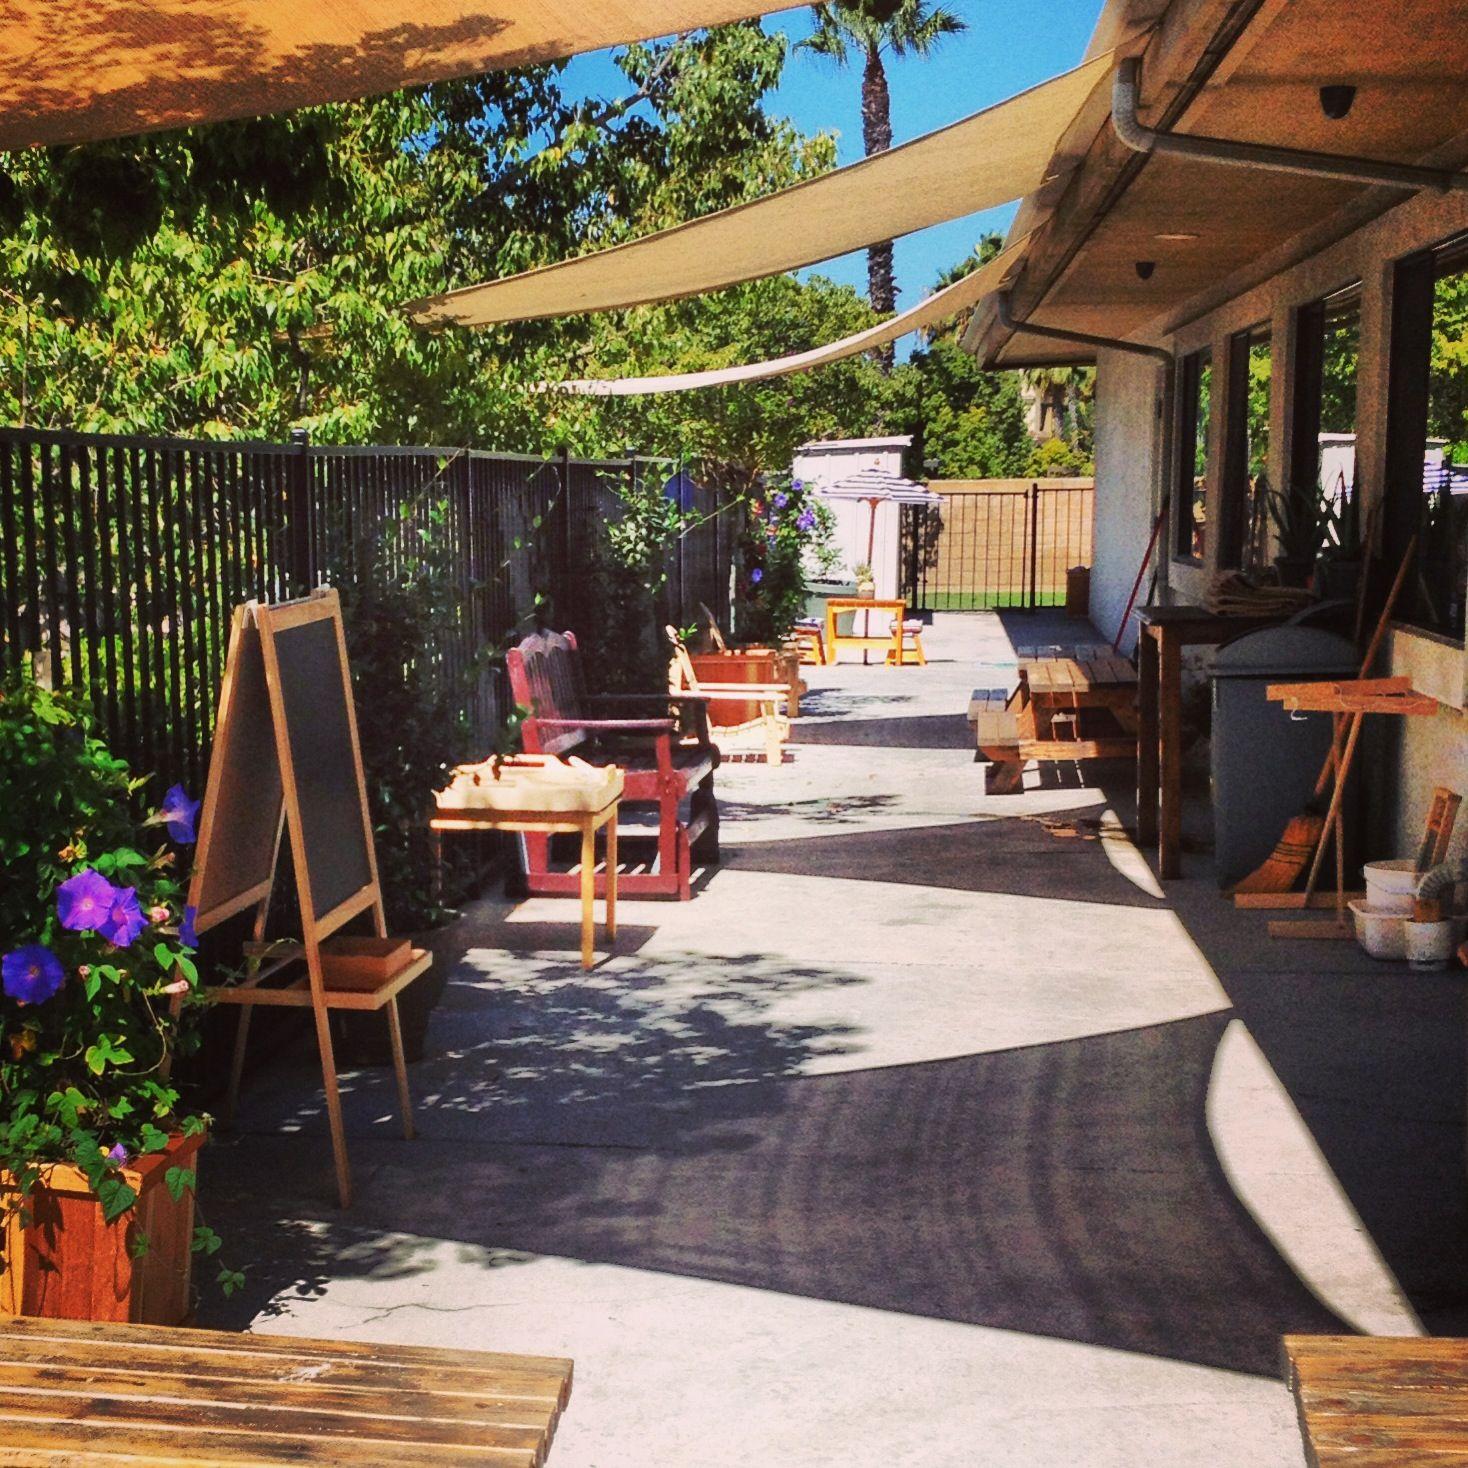 Outdoor Work Area For Gardening Painting Exploration At Mission Montessori Montessorimv